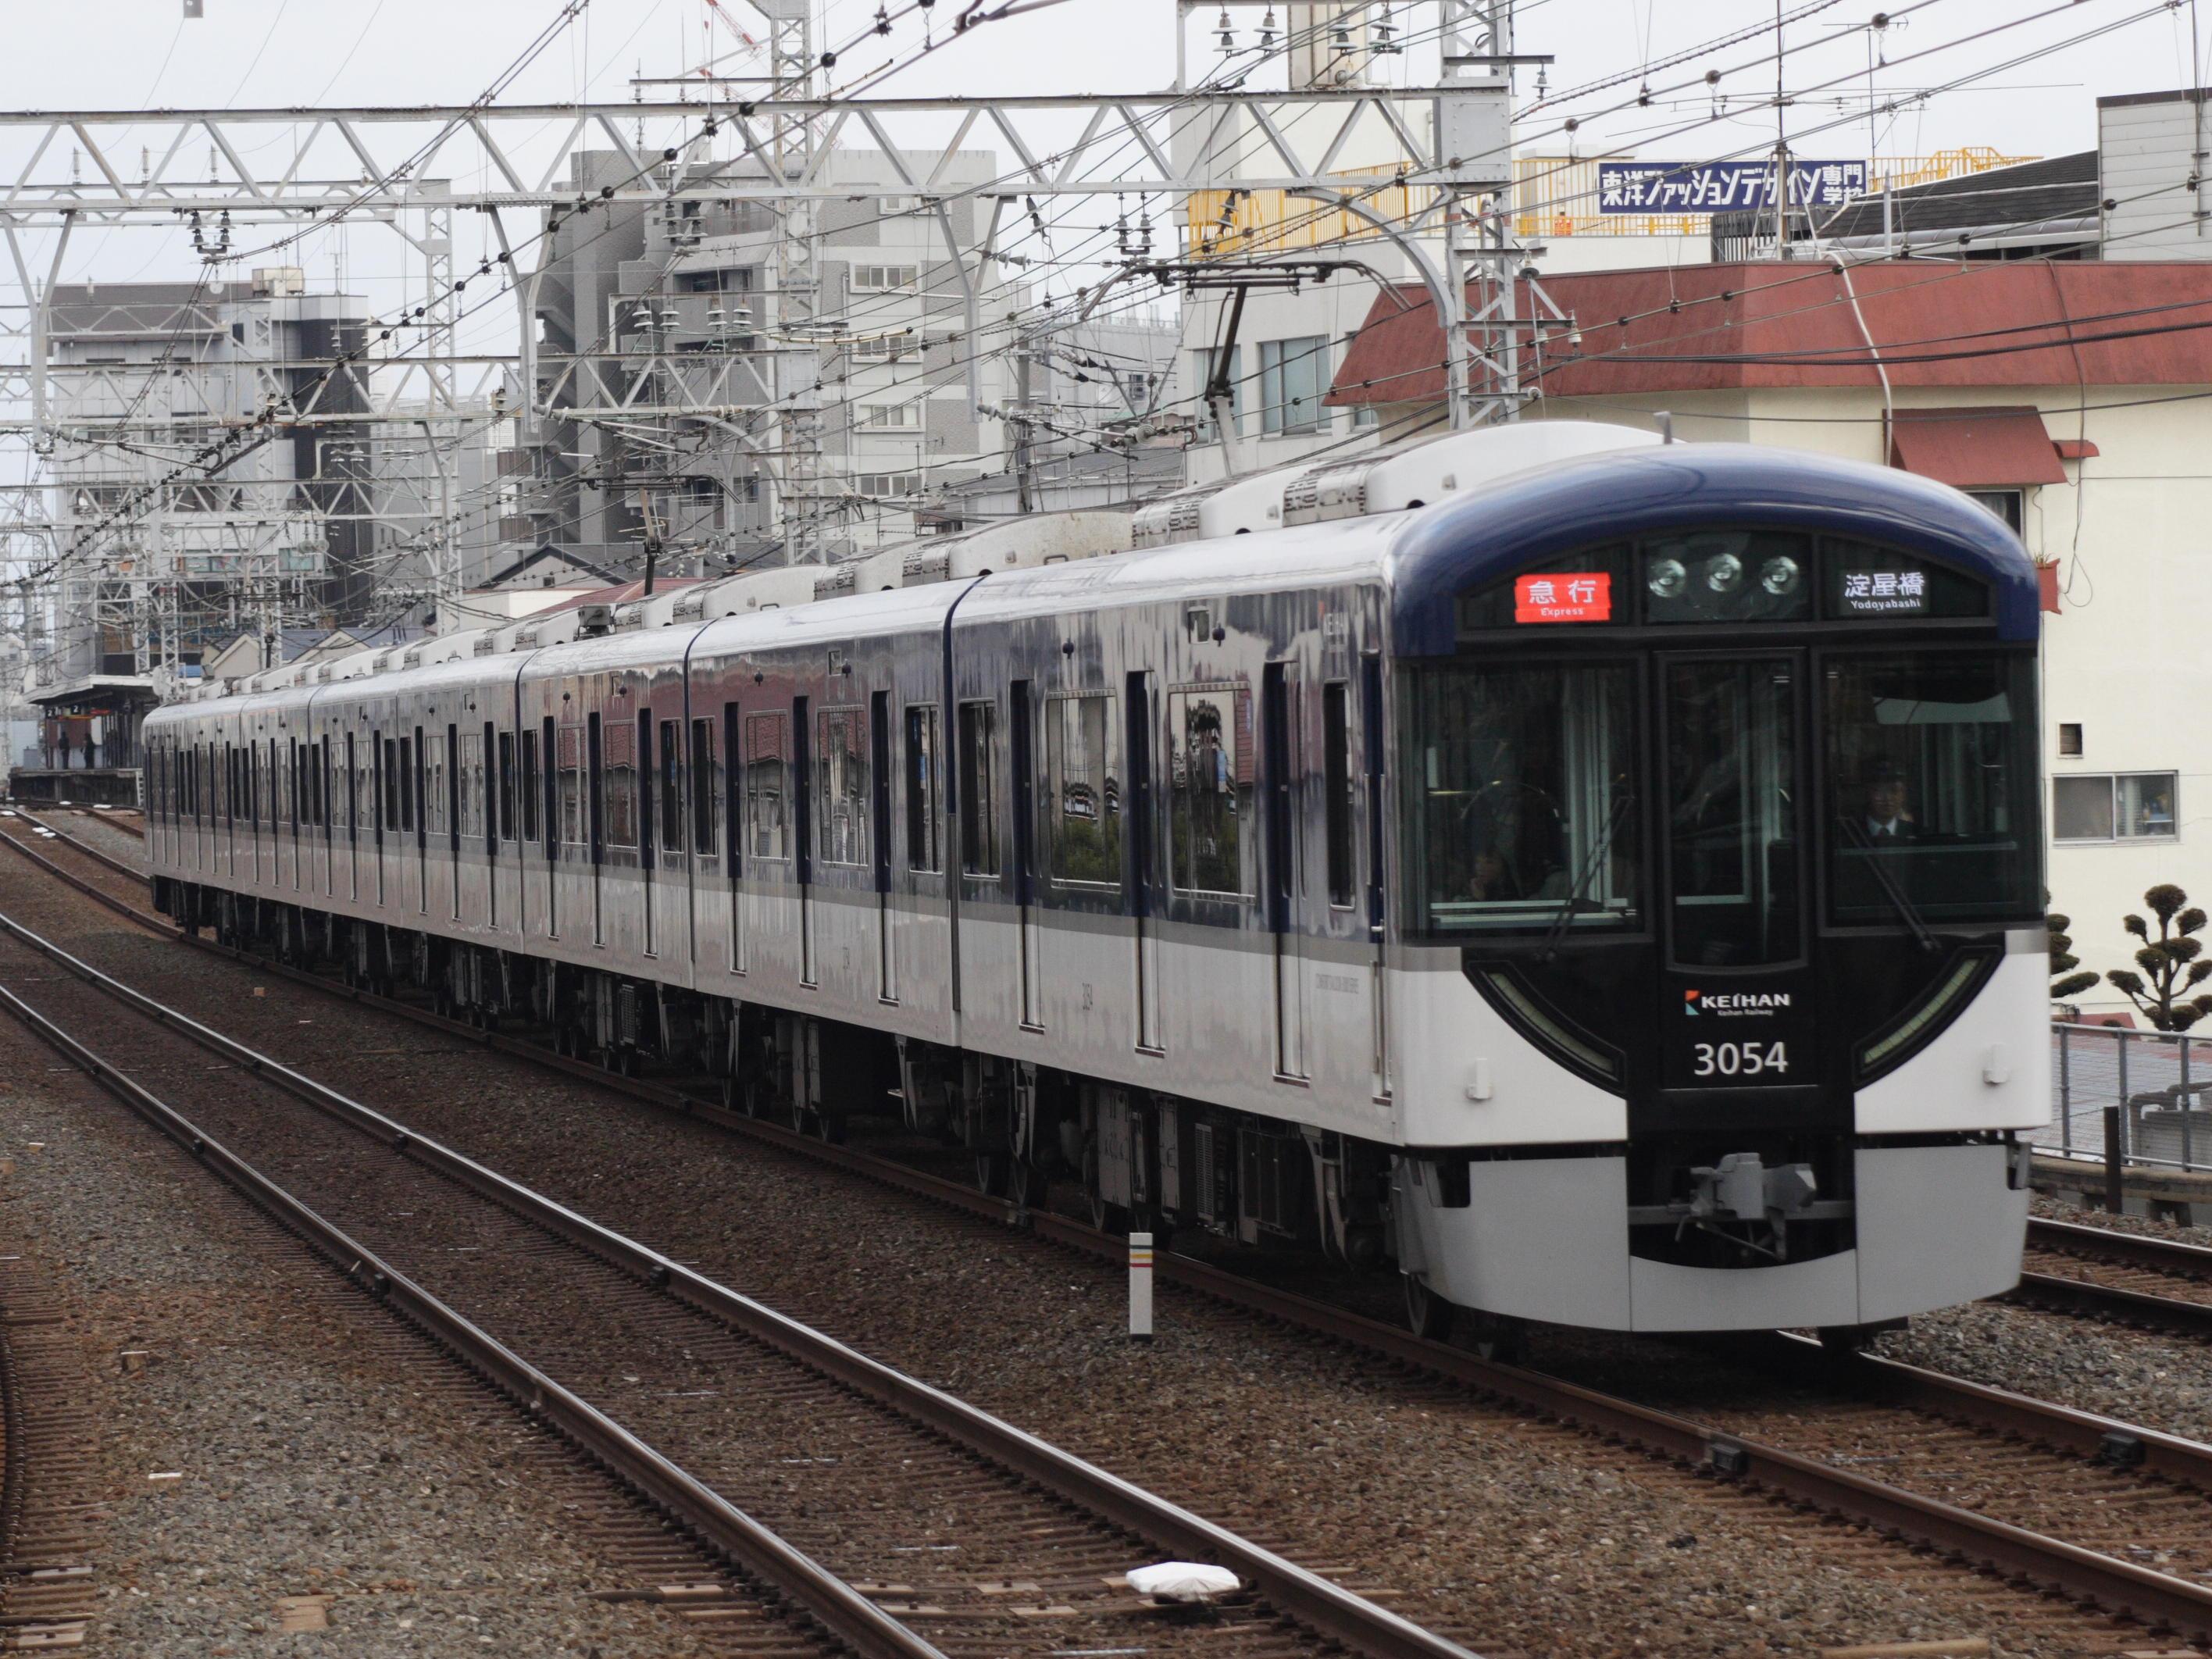 19 December 2009 Metrobabel Voucher Keihan Kyoto Osaka Sightseeing Pass 1 Day 3000 Express From Wikipedia